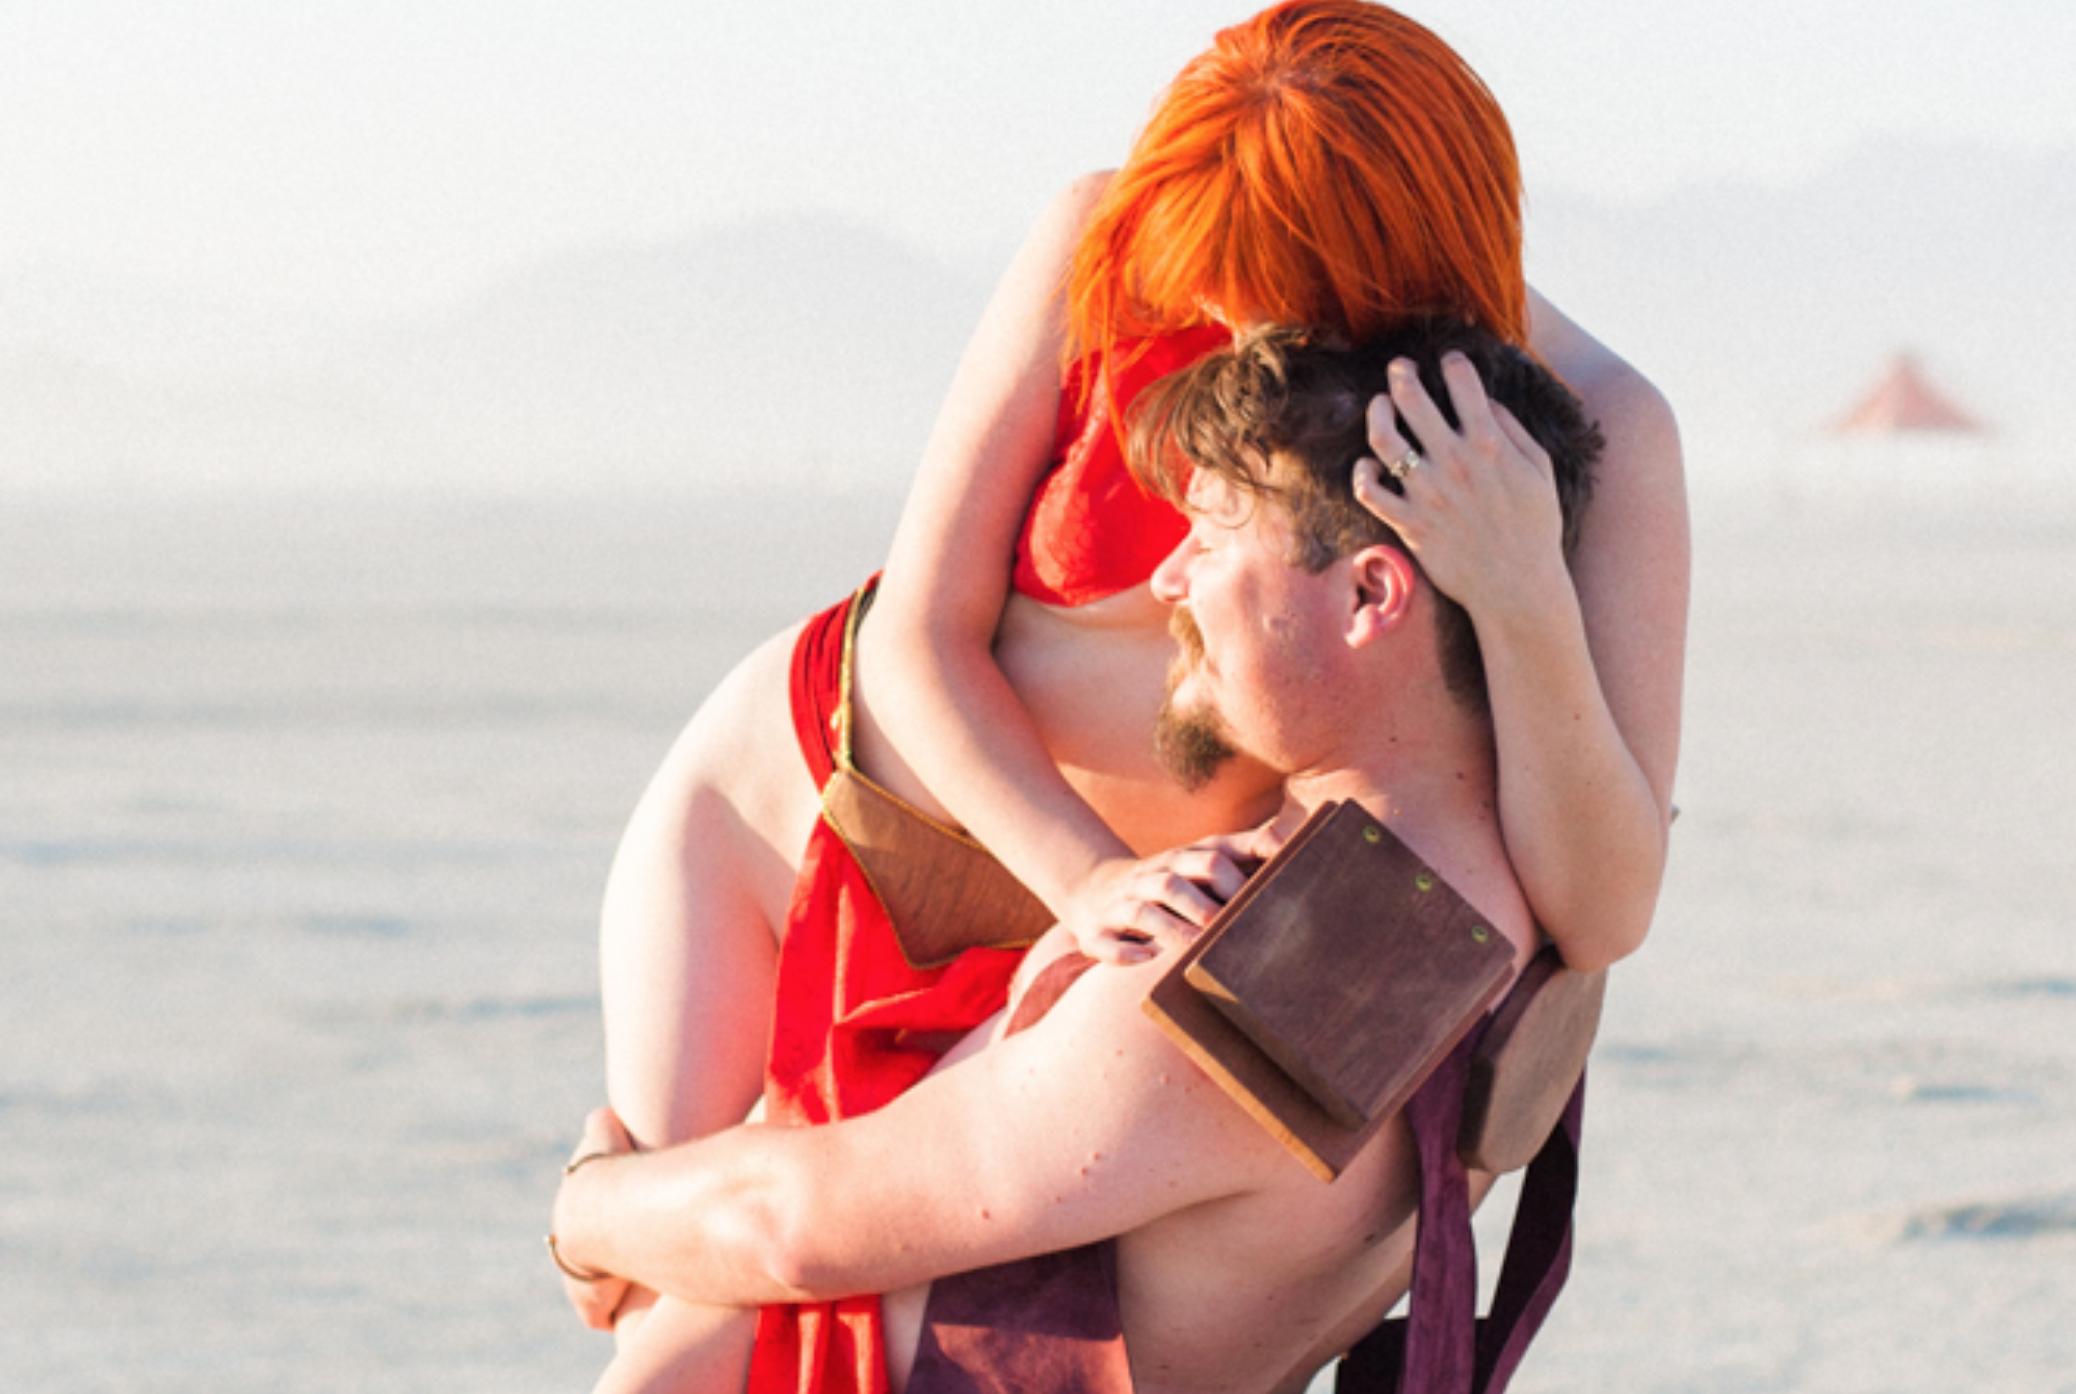 Angela + Michael || A Burning Man Destination Elopement